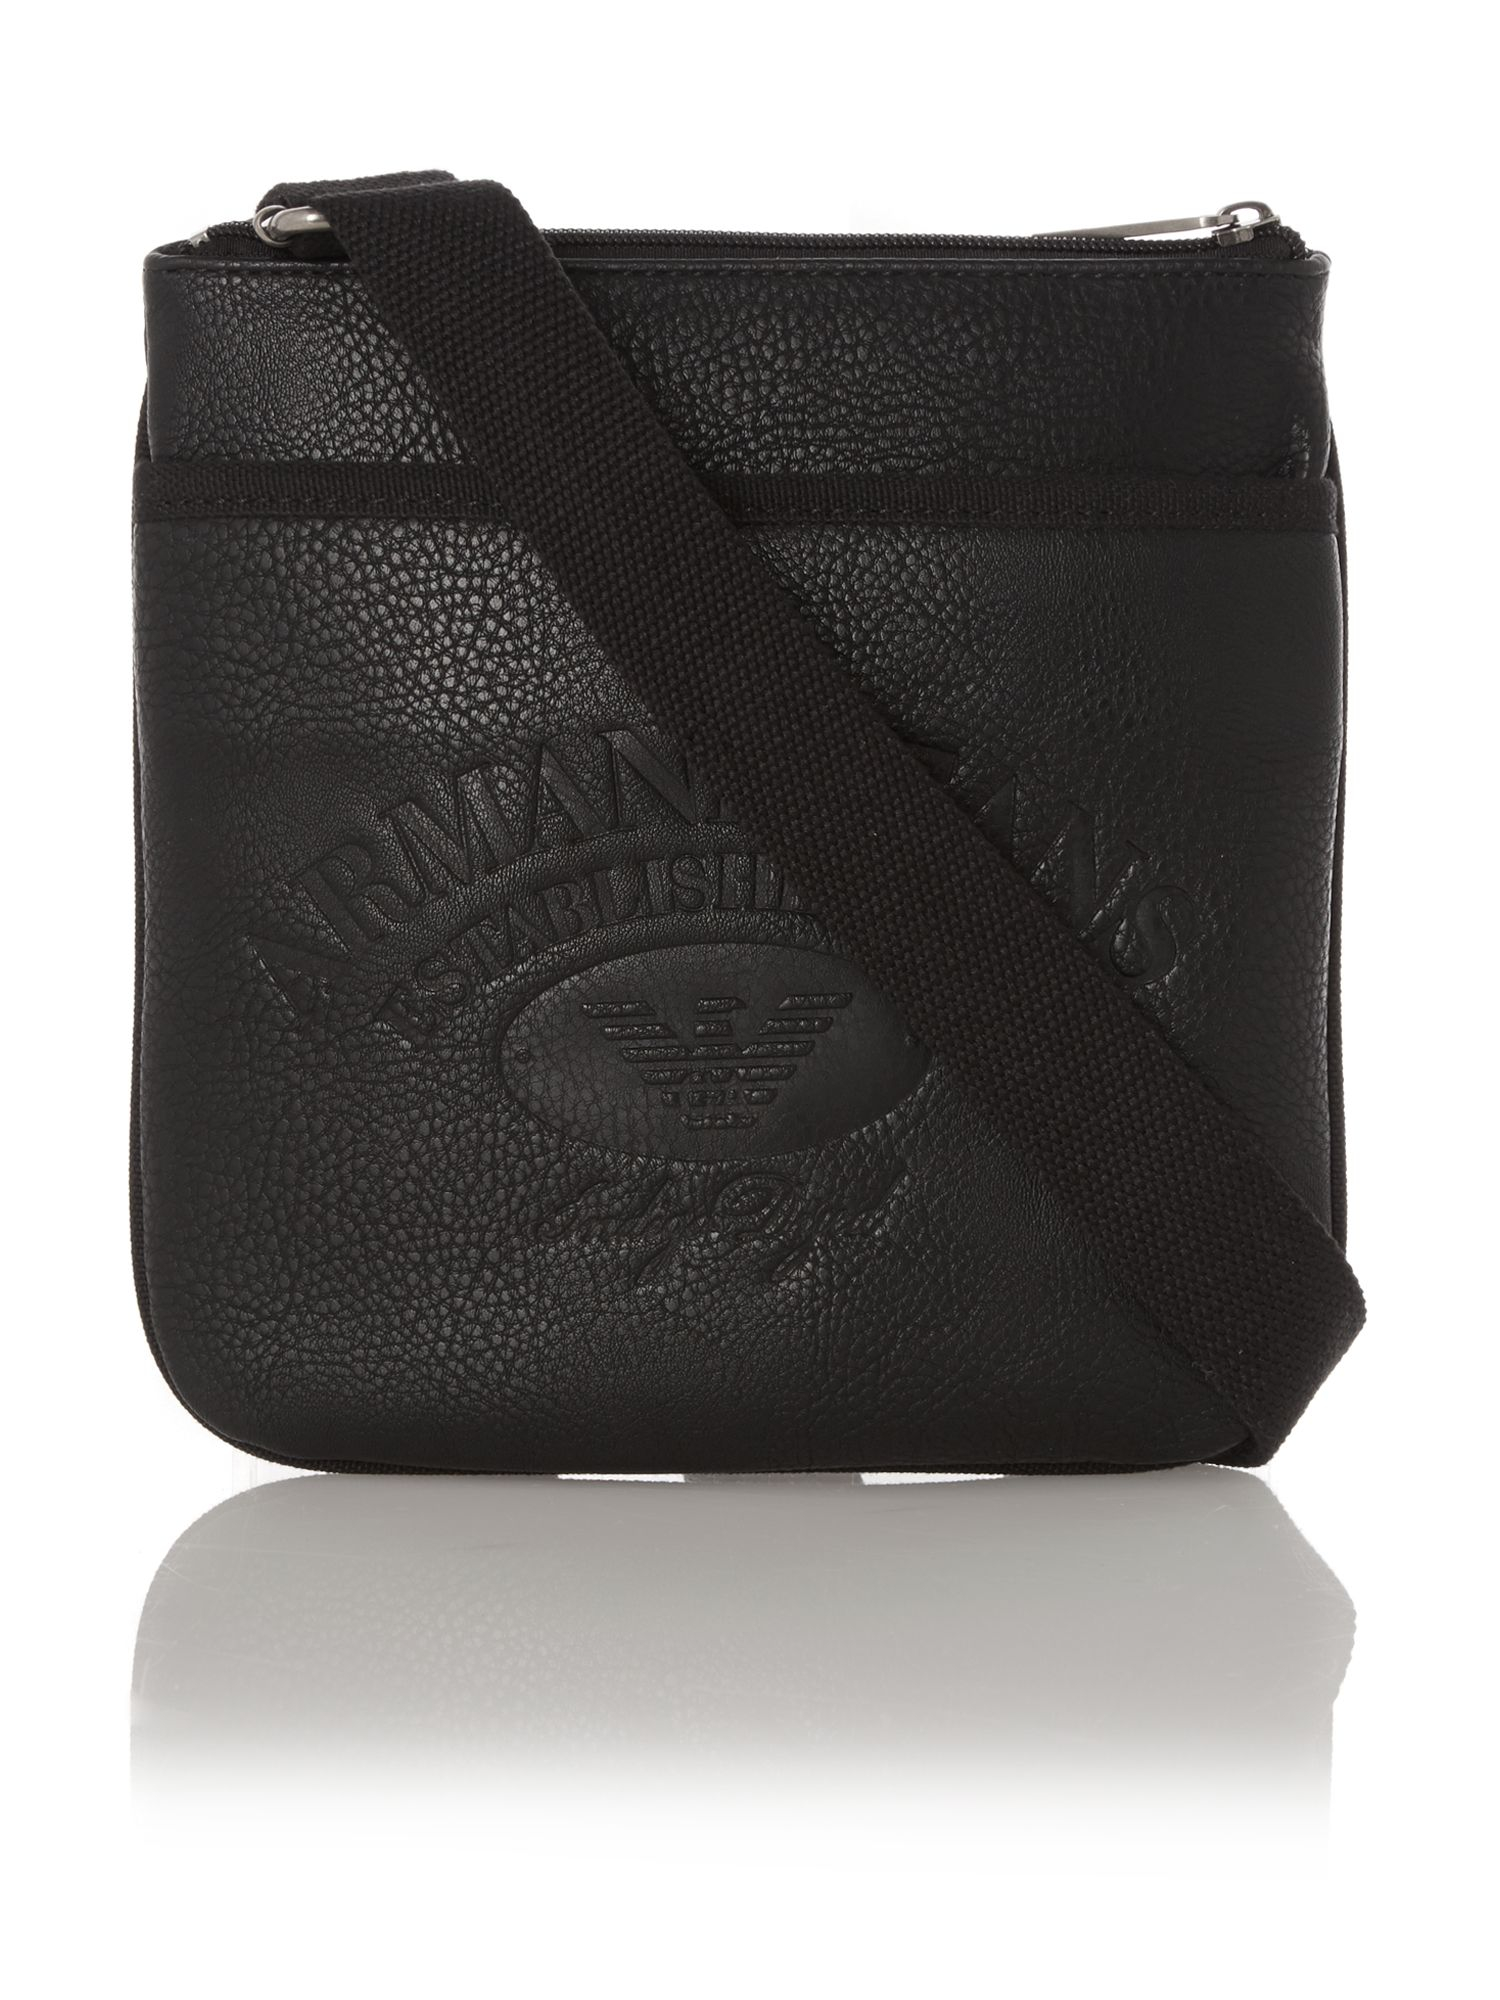 Armani Jeans Large Logo Small Man Bag In Black For Men Lyst. Armani Jeans  Pvc Shoulder Bag Nero Black Women Wallet House Of Fraser d42b5e1f8b4c5